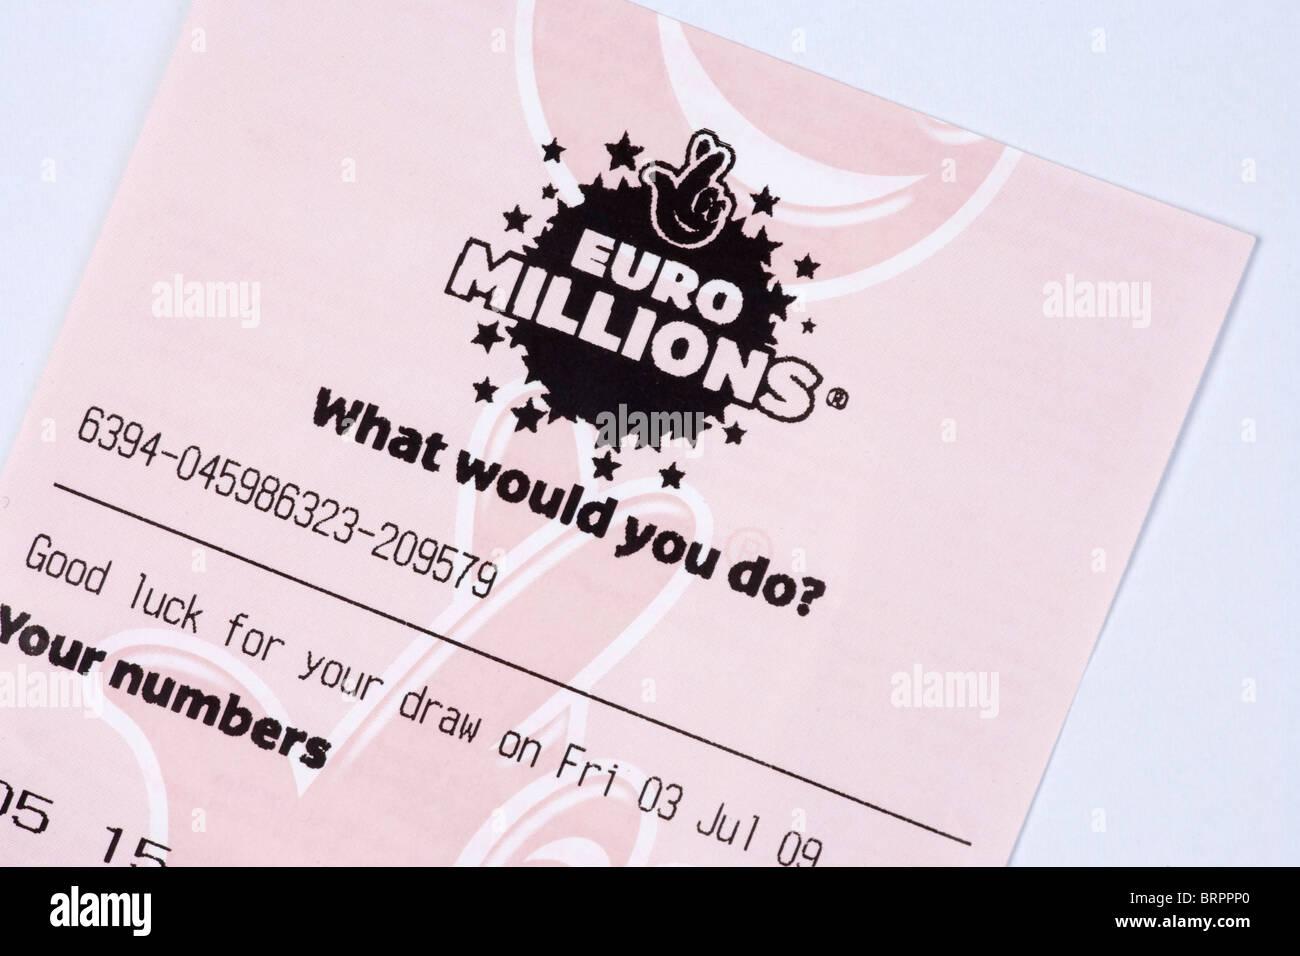 Euro Millions lottery ticket - Stock Image